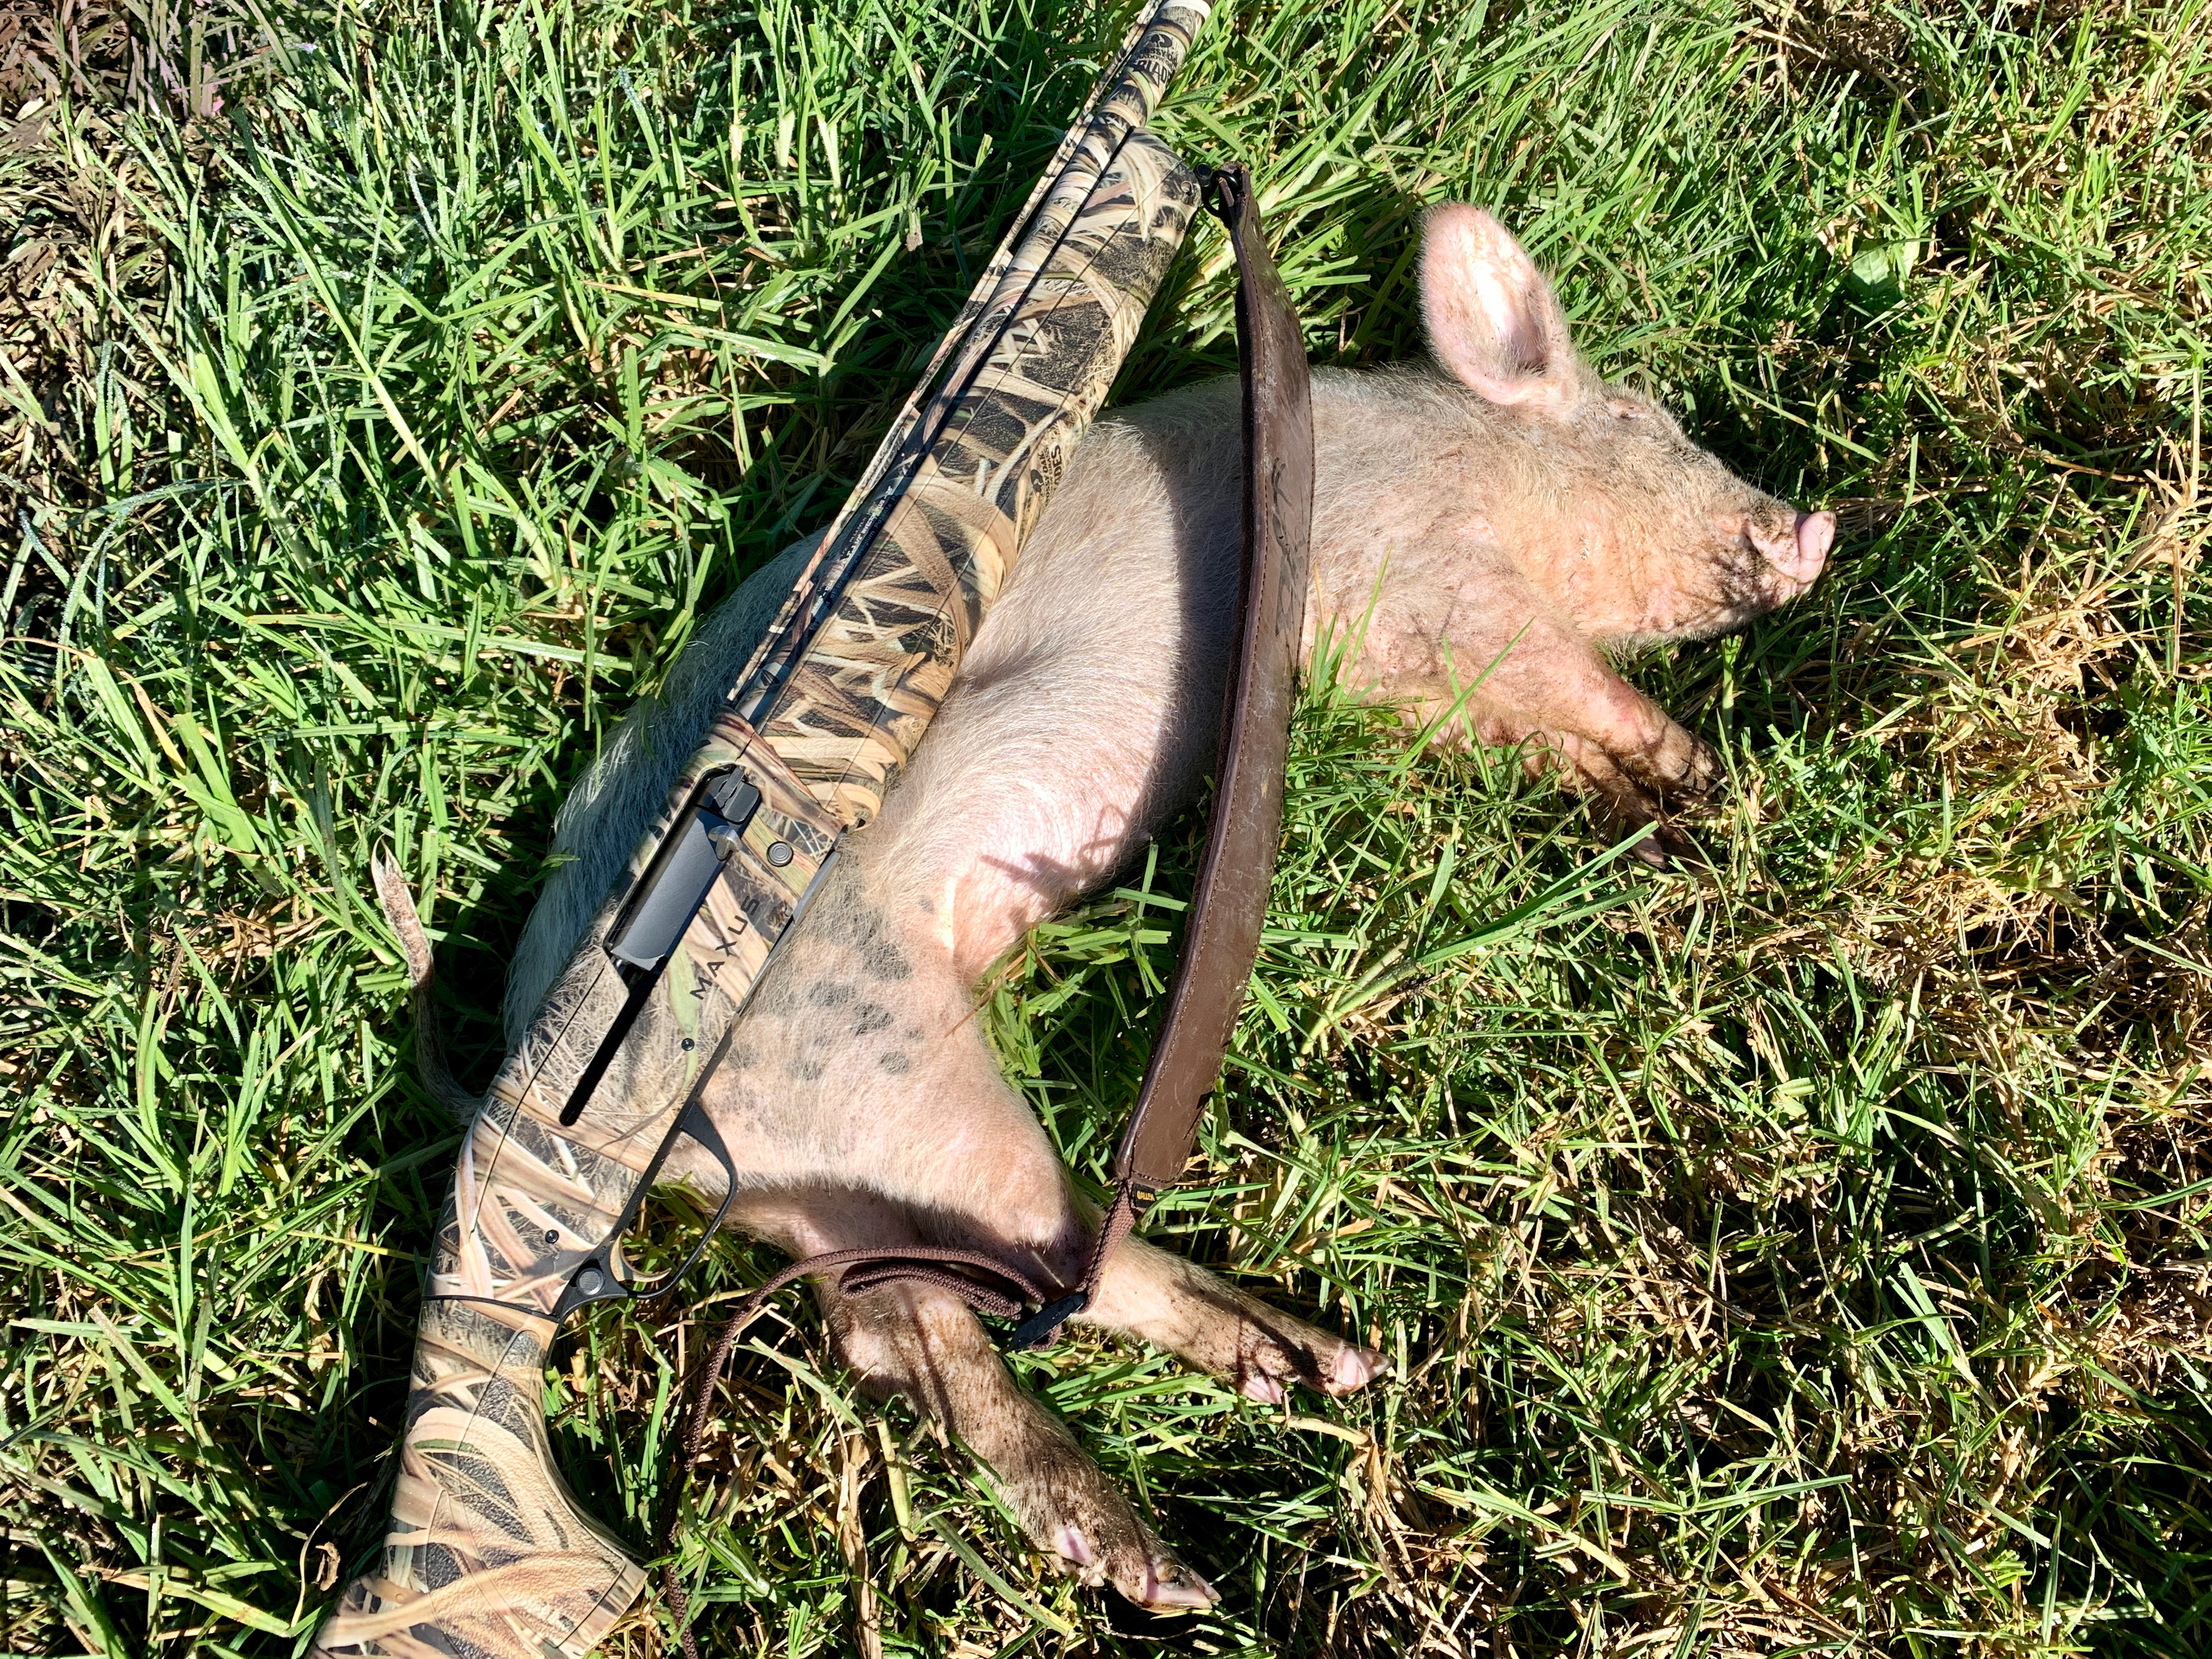 Hunting-Pig1.jpg